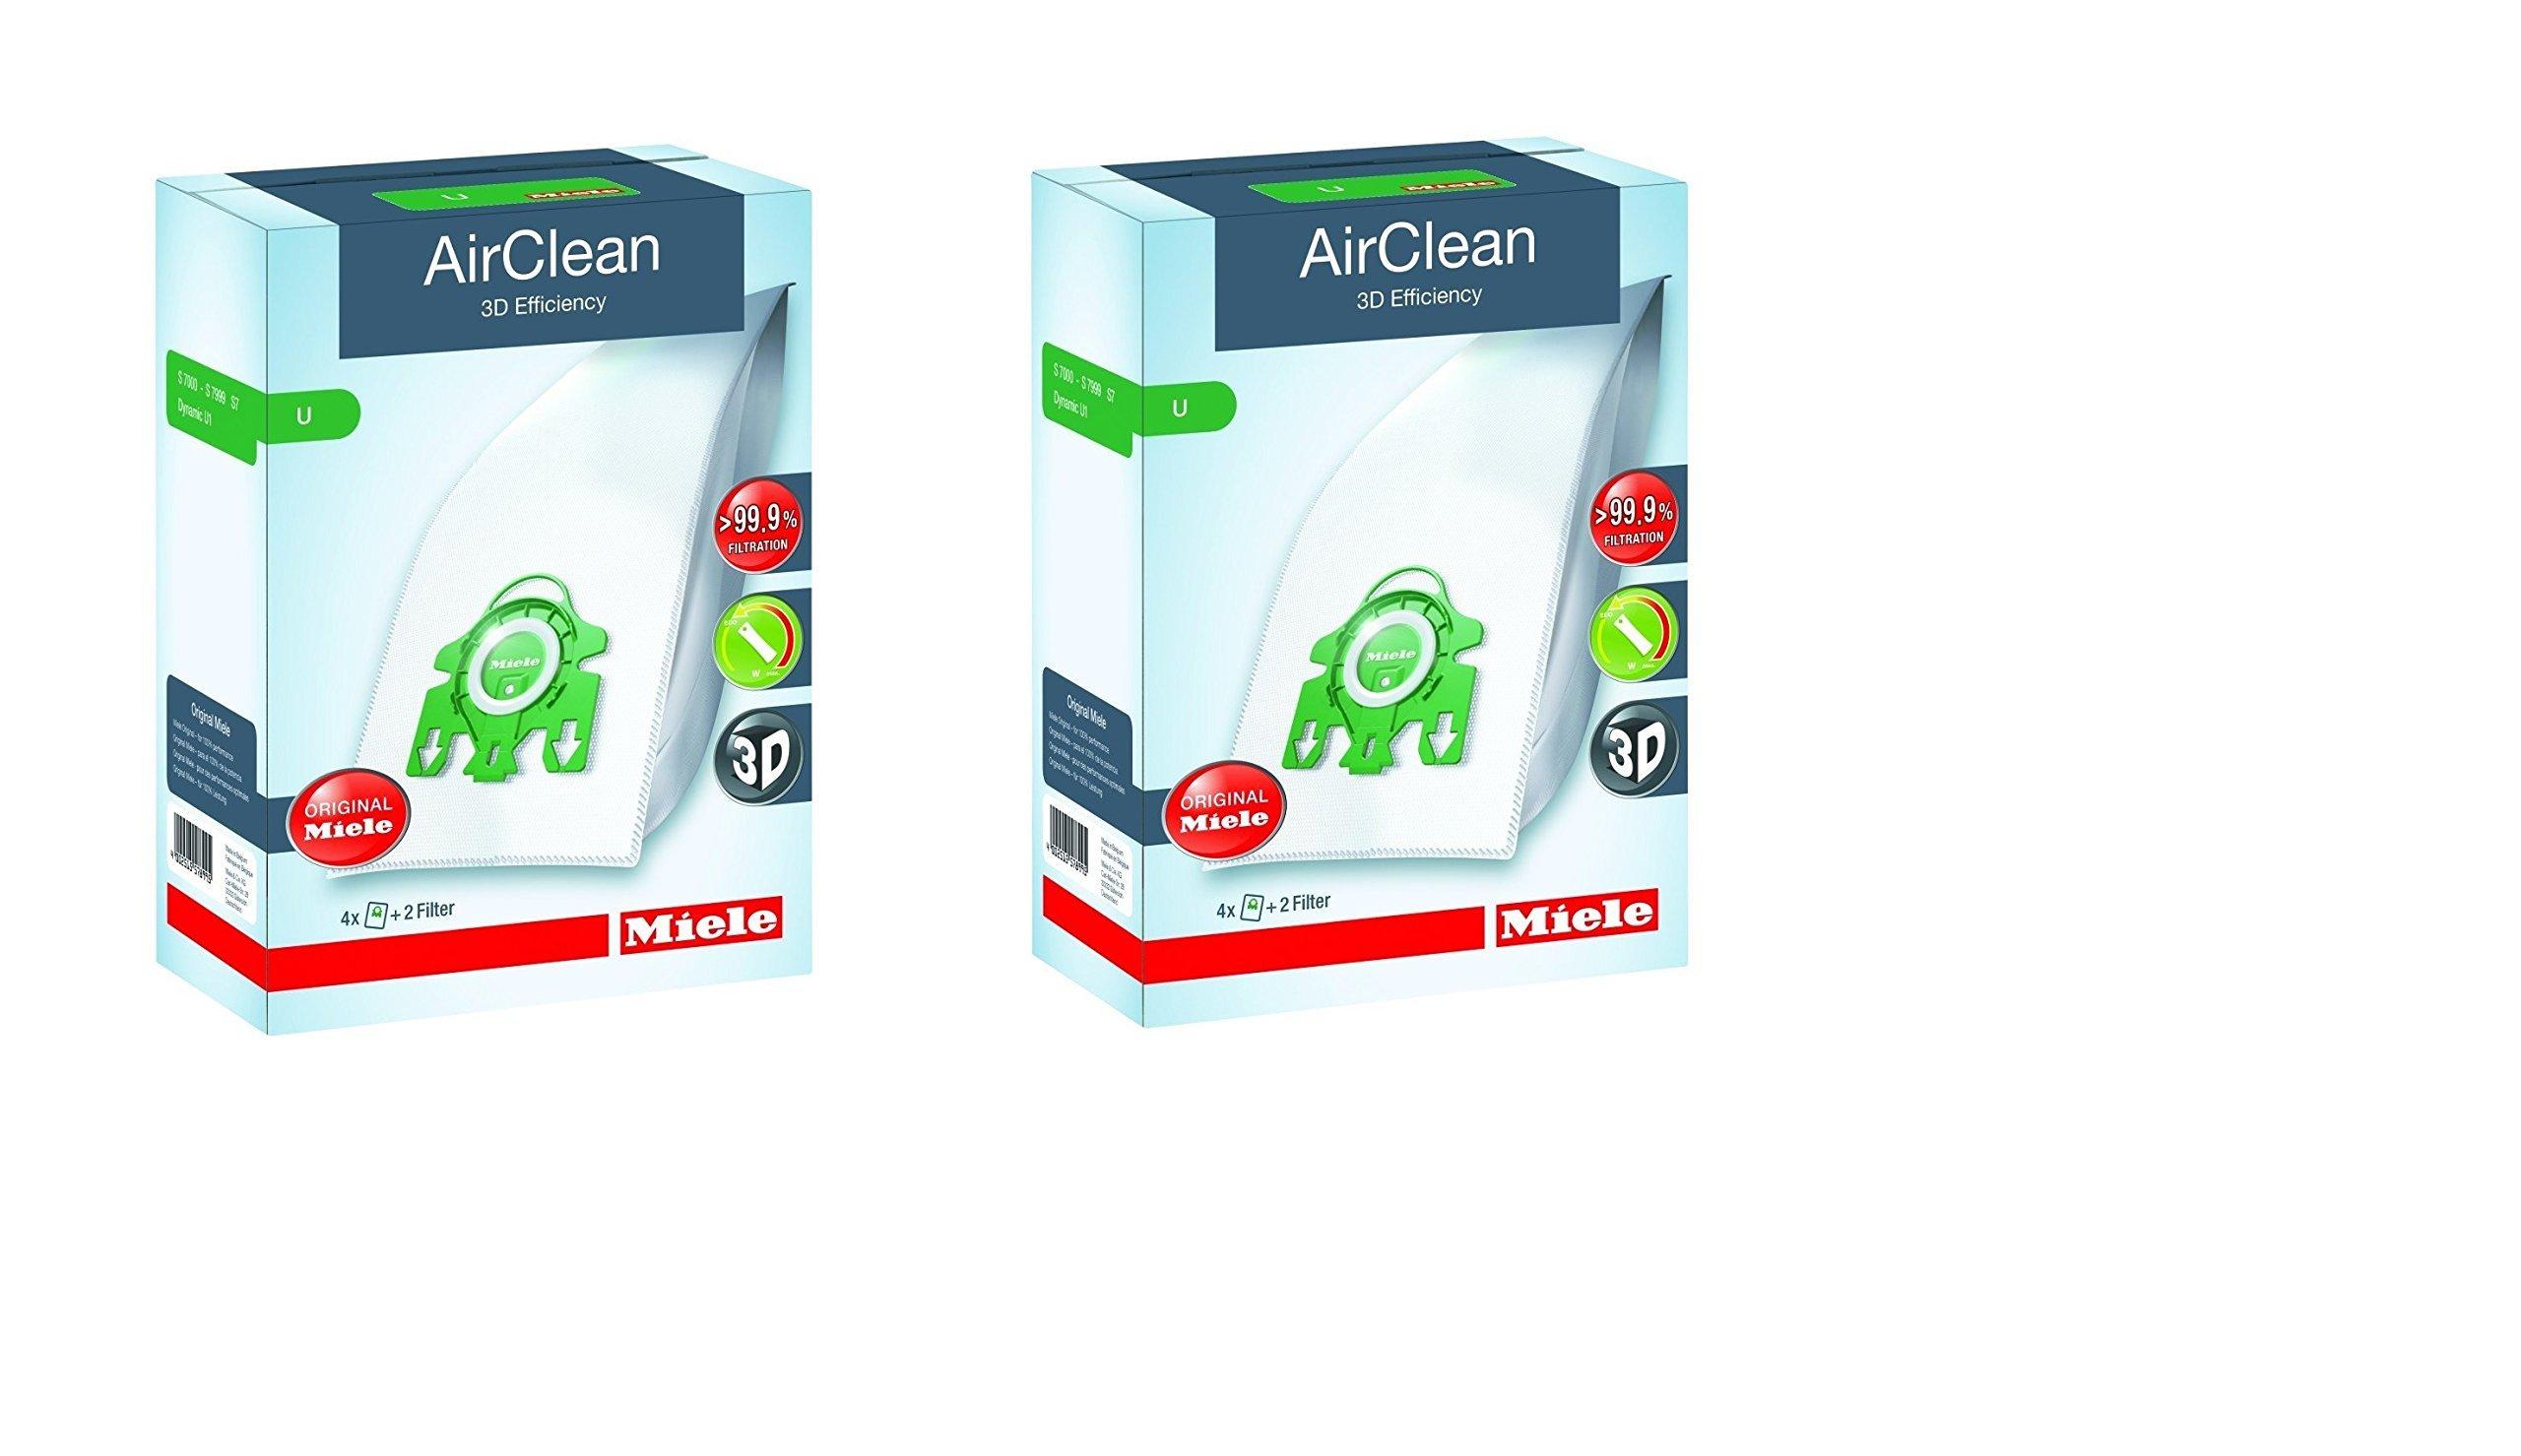 Miele AirClean 3D Efficiency Dust Bag, Type U, 8 Bags & 4 filters by Miele